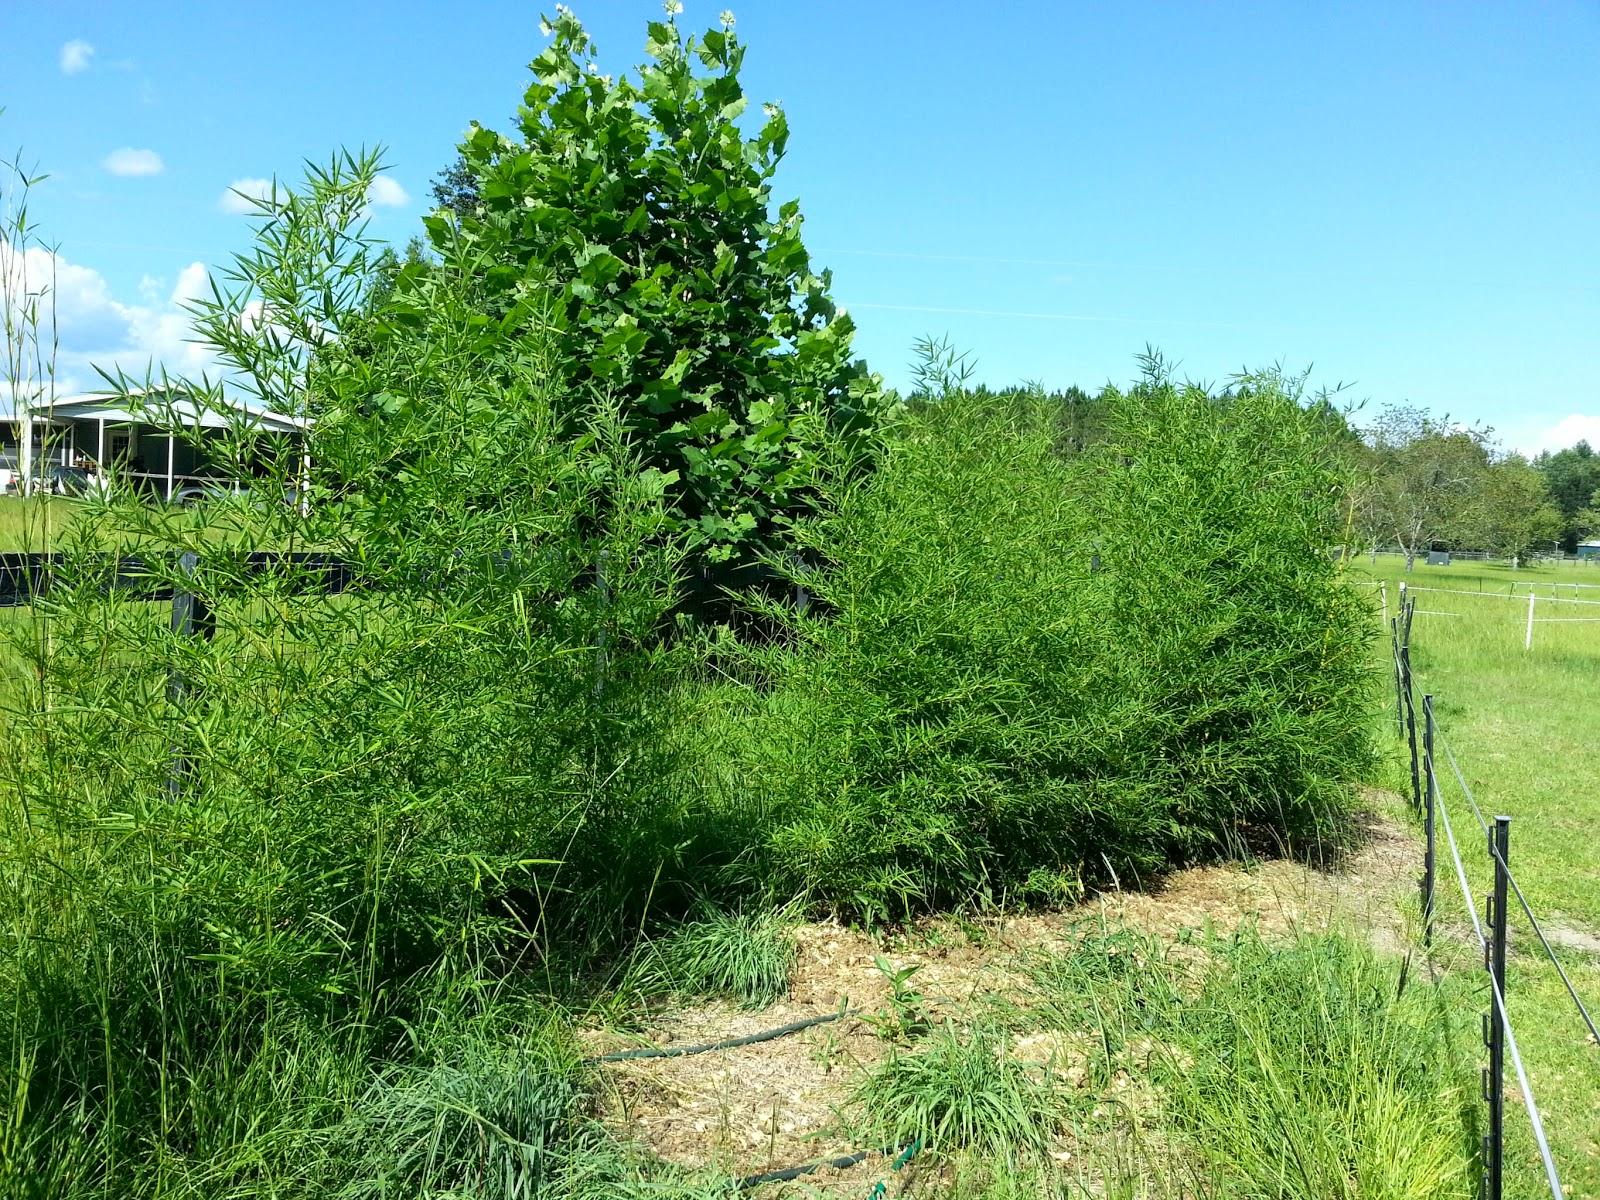 Growing Running Plants in Florida